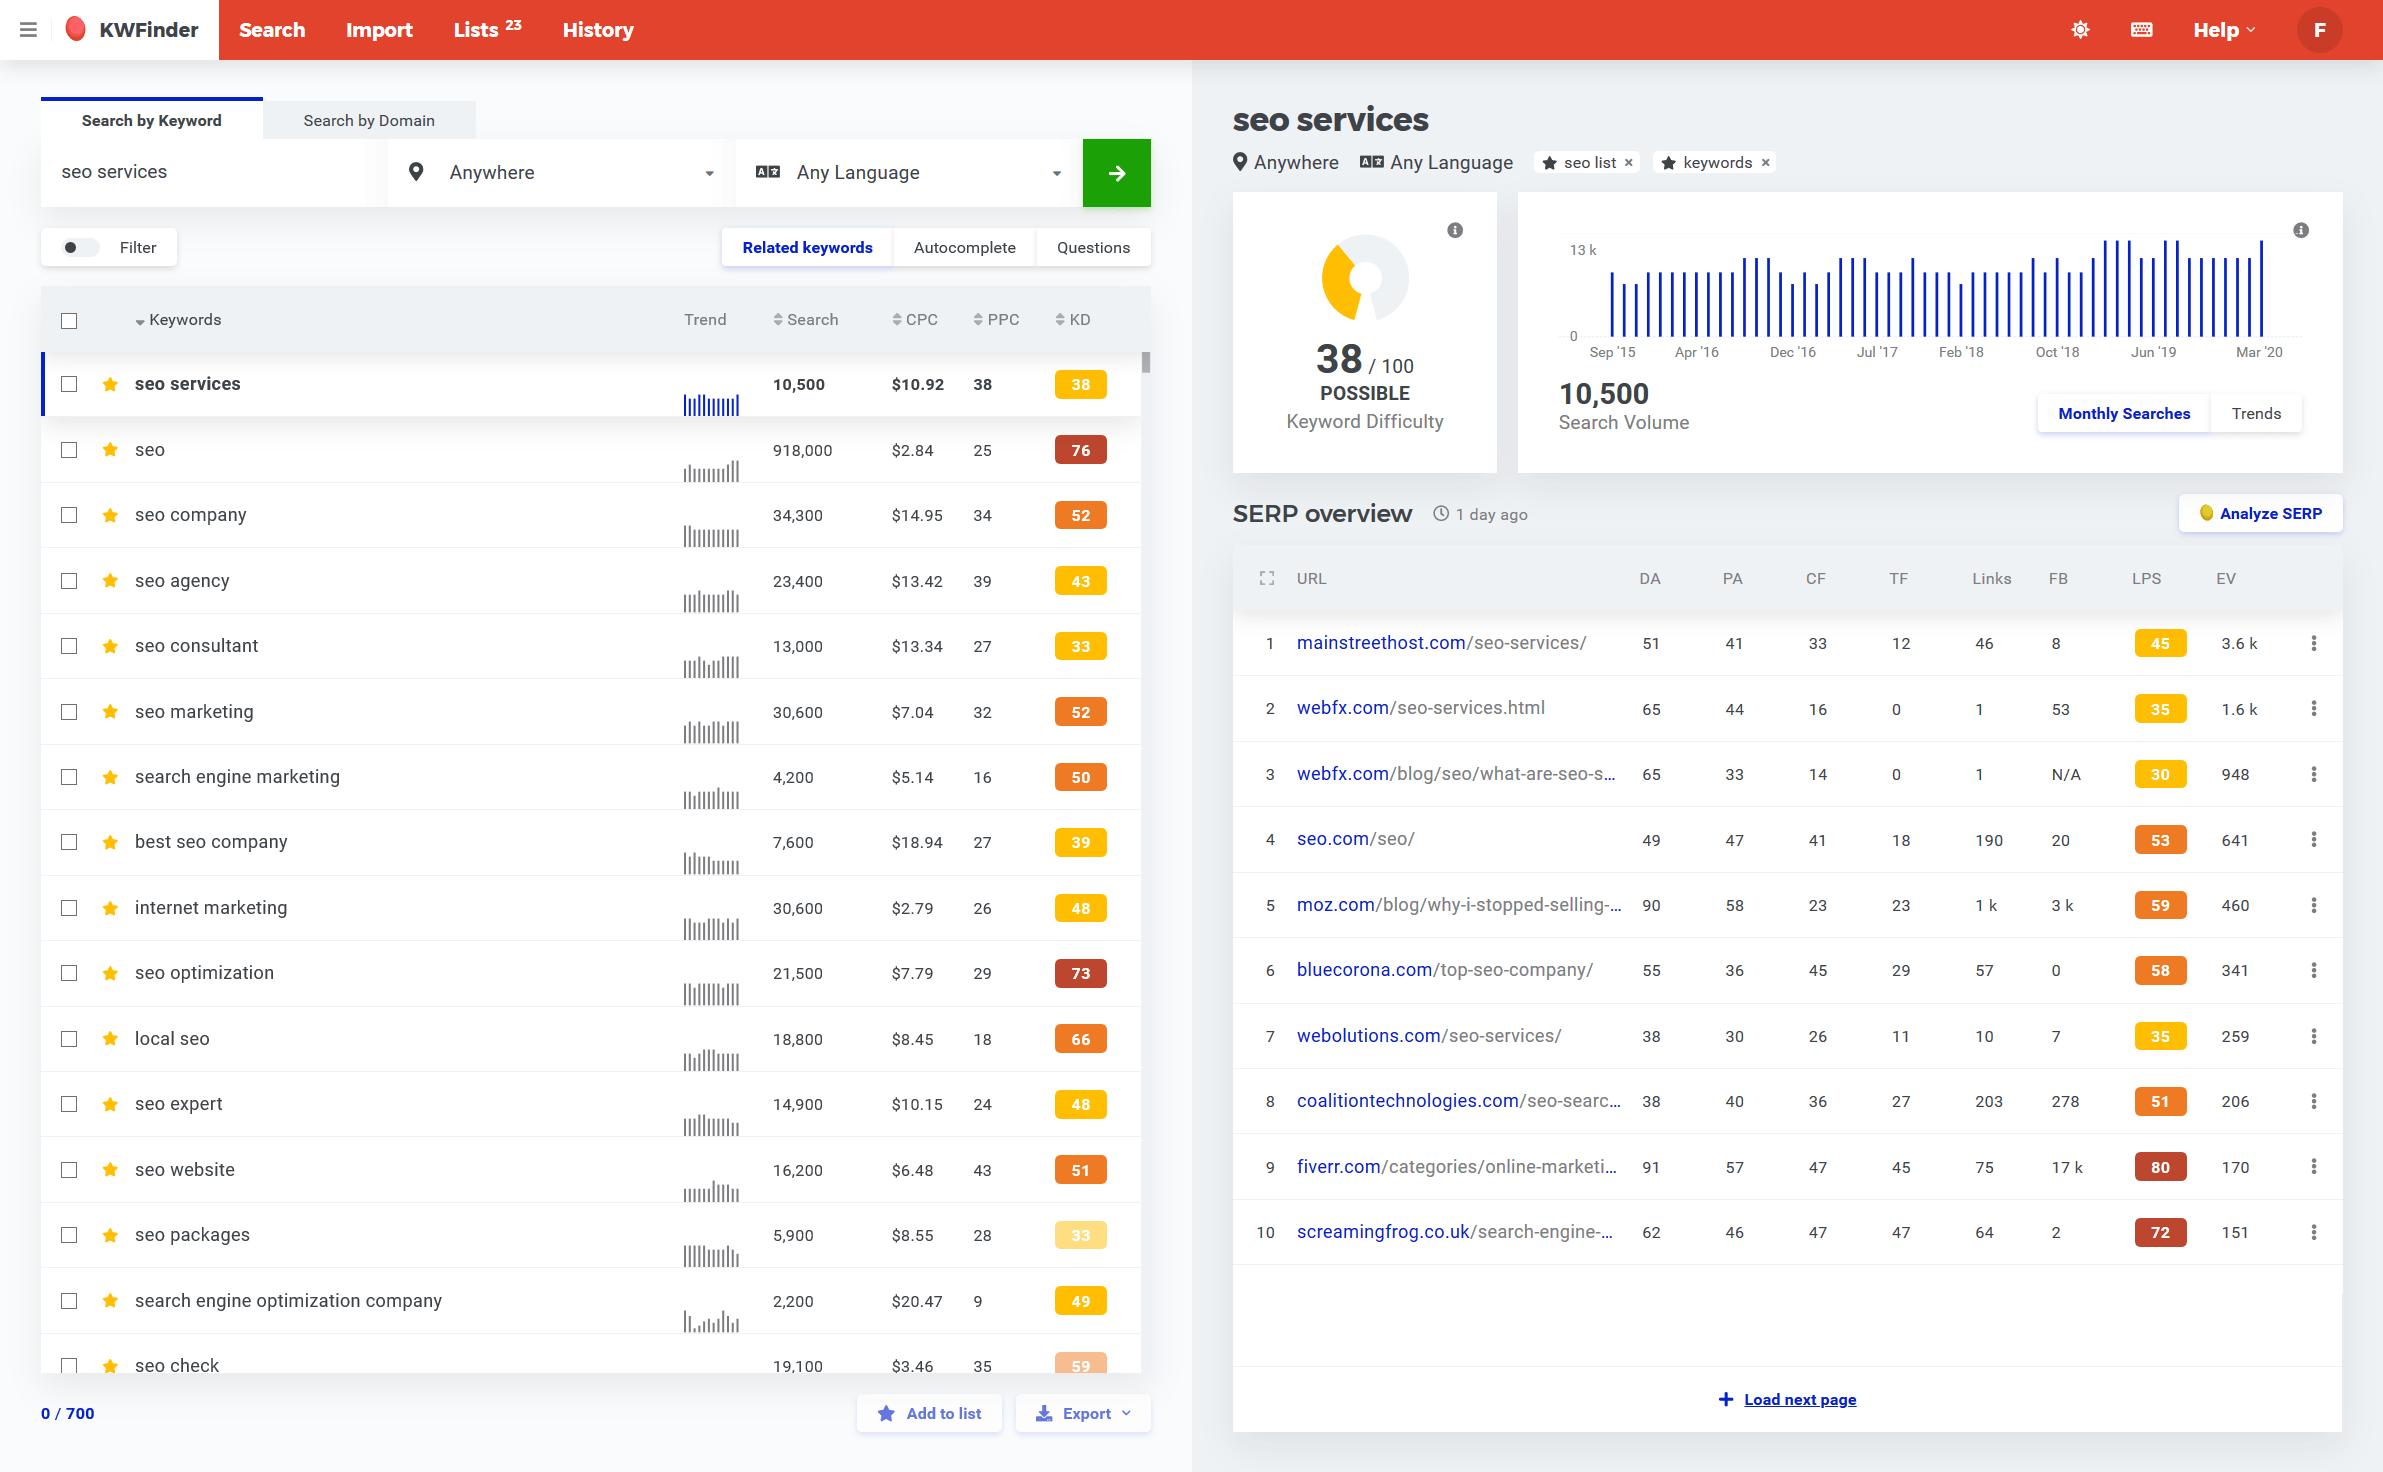 Screenshot of KWFinder - keyword research tool by Mangools